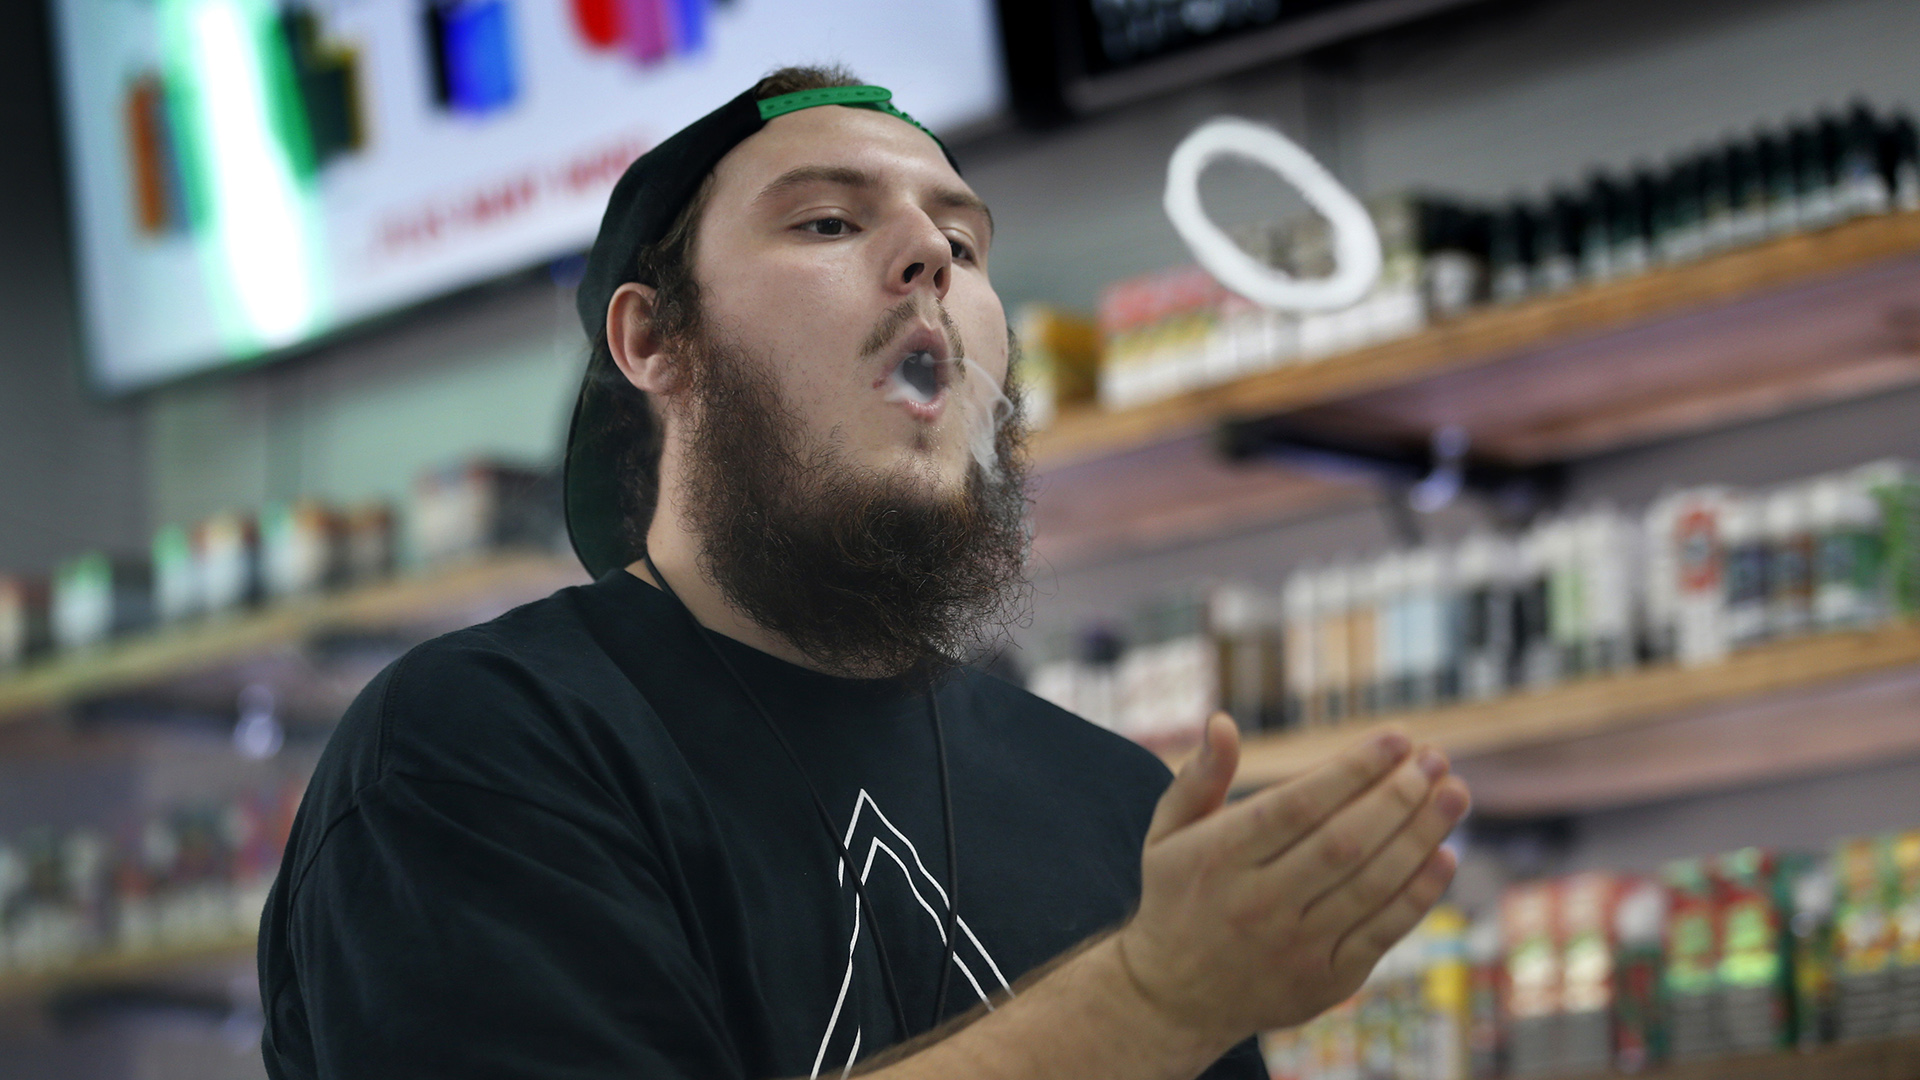 Mint, Menthol: Vape Industry Has Dug Heels In On Flavor